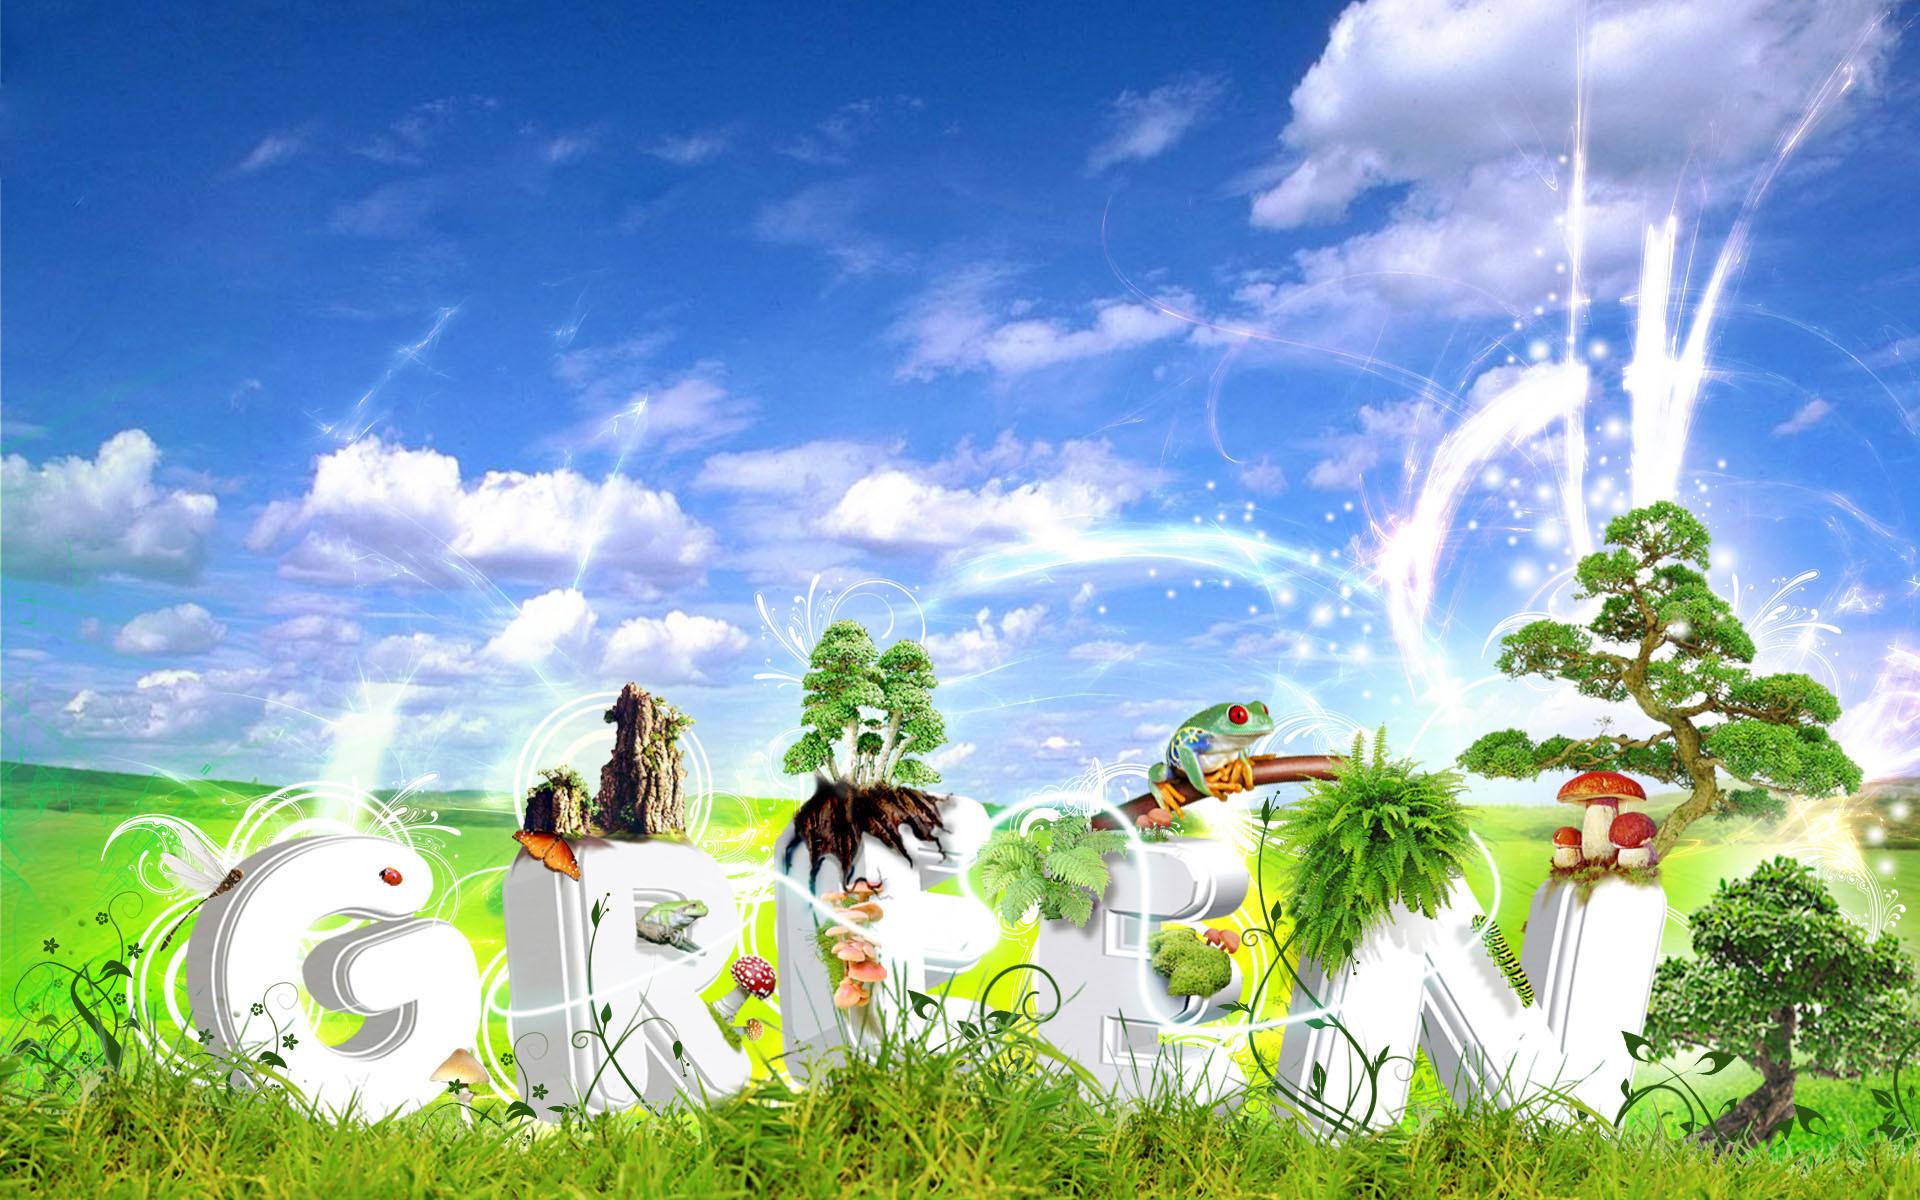 Creative Cartoon Spring High Definition Widescreen Lcd 460366 Wallpaper  wallpaper